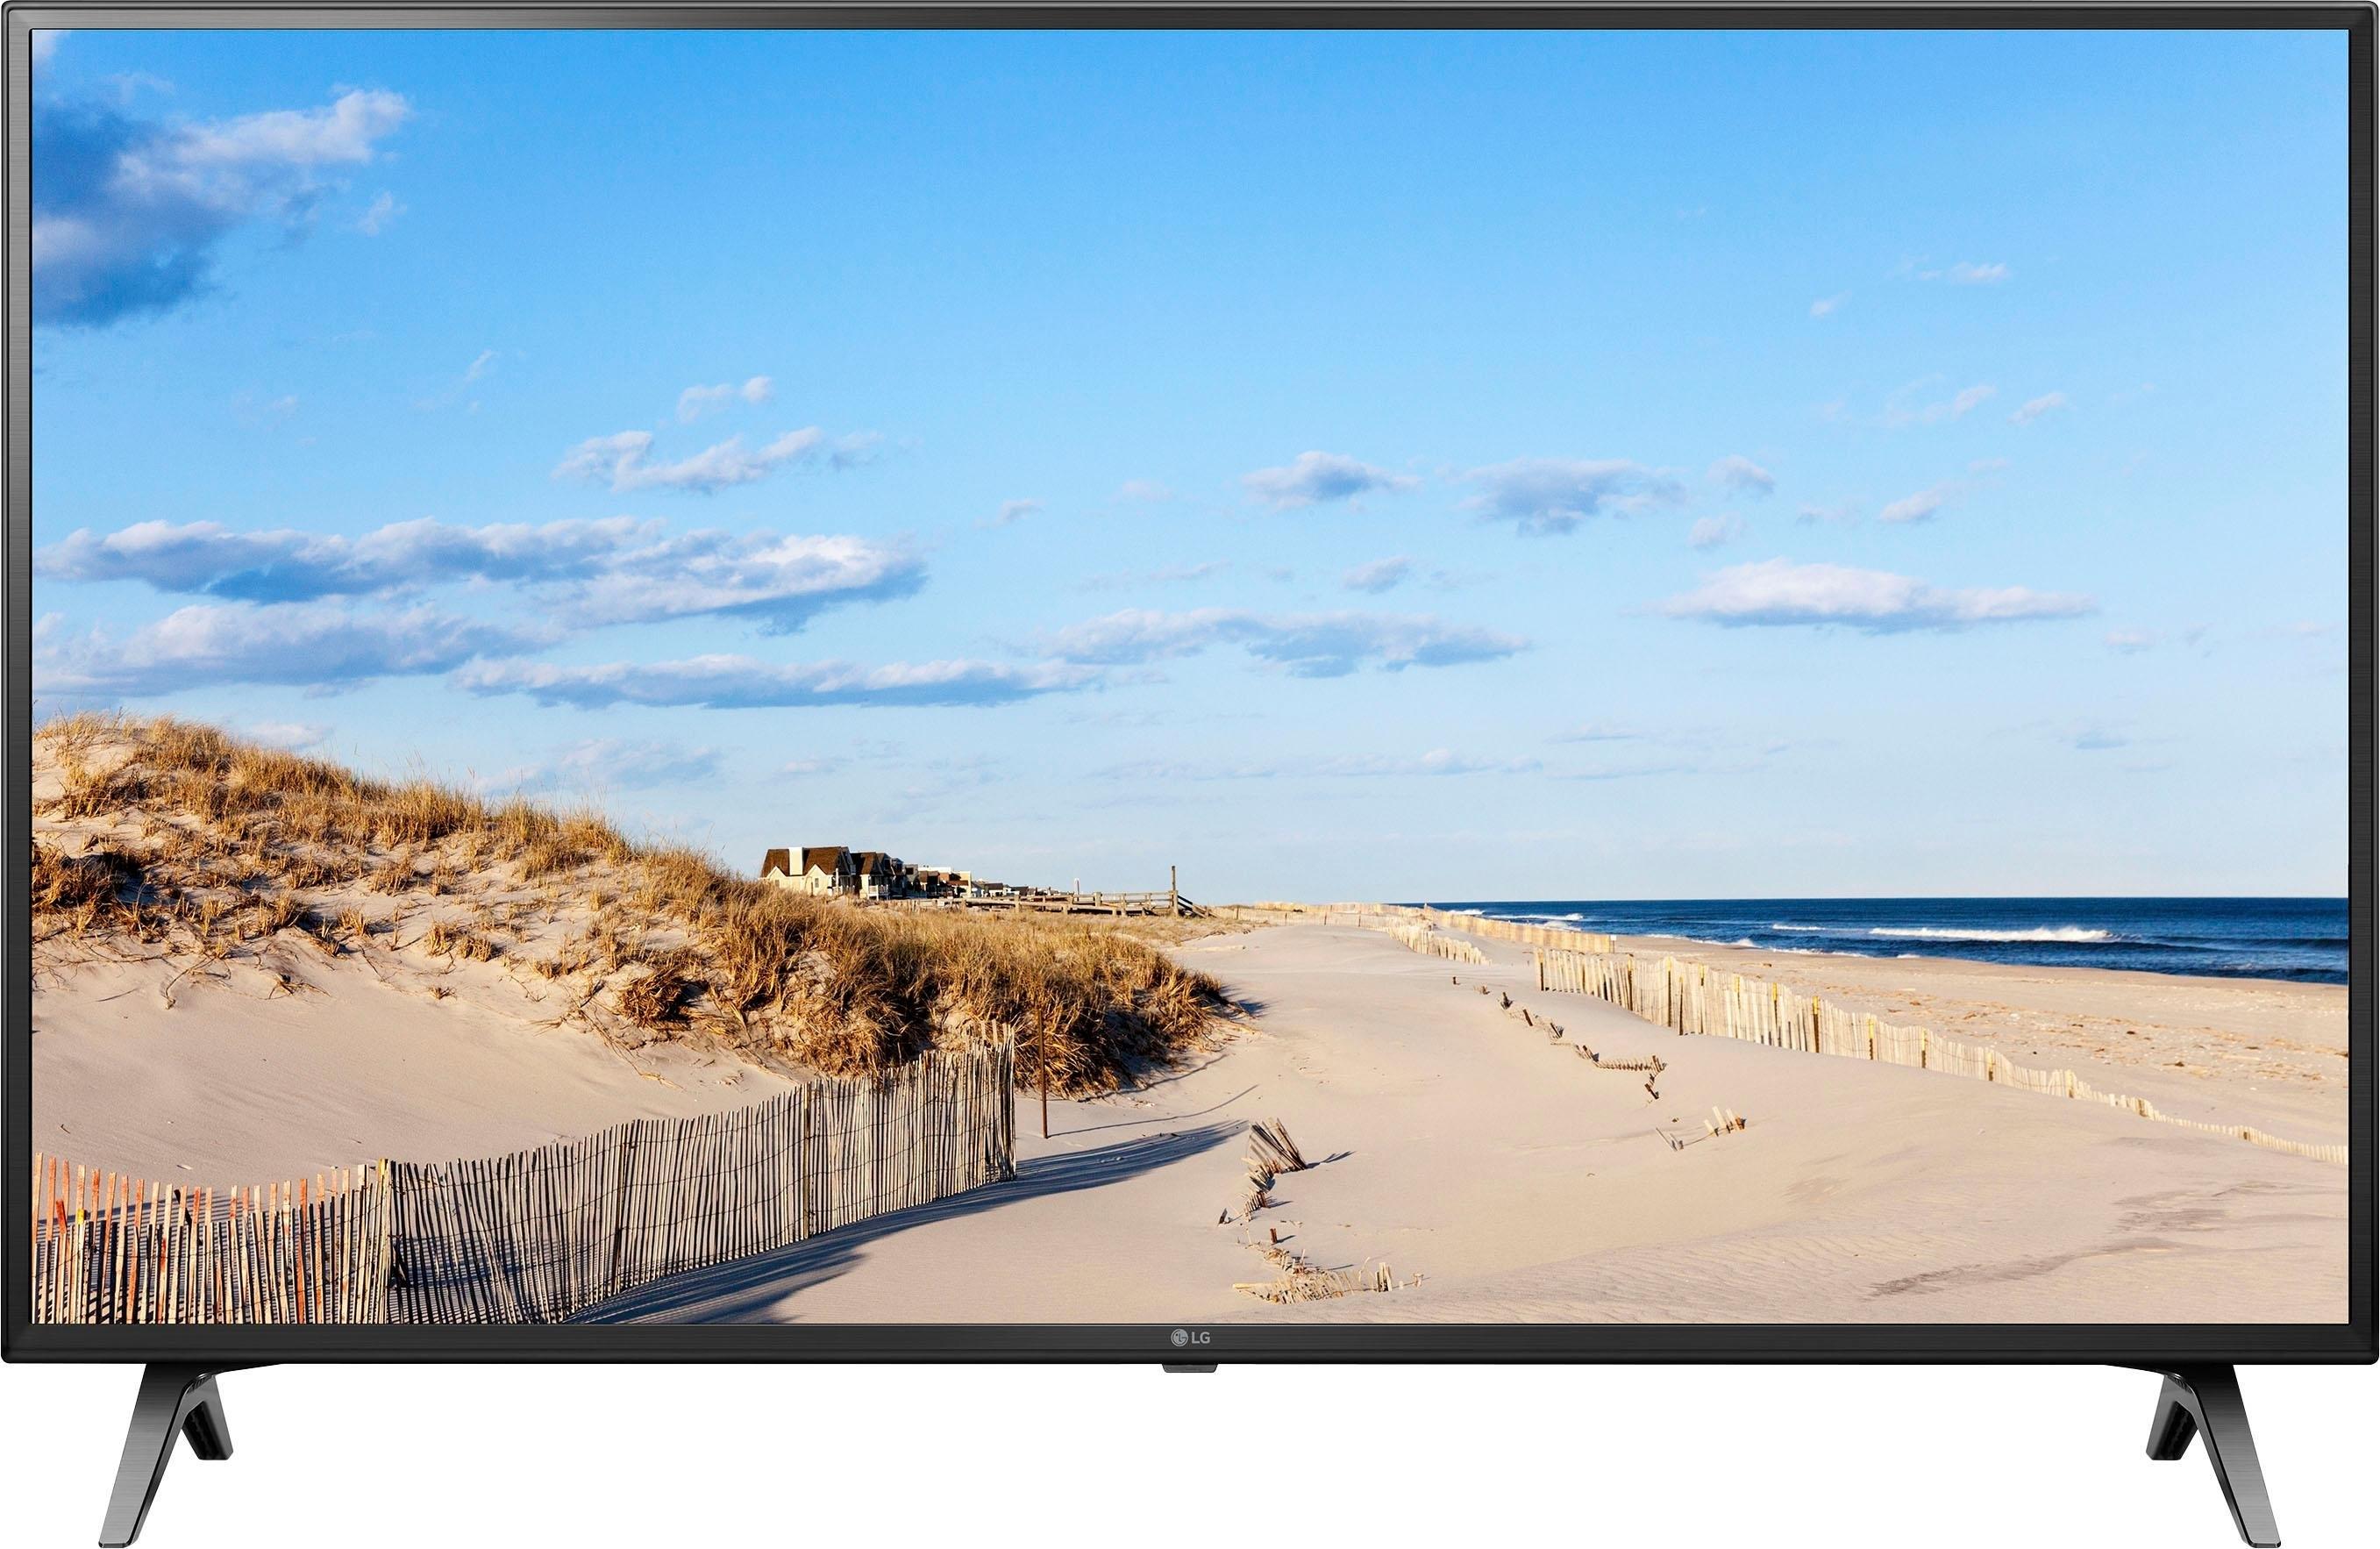 LG 65UM7000PLA led-tv (164 cm / 65 inch), 4K Ultra HD, smart-tv nu online kopen bij OTTO